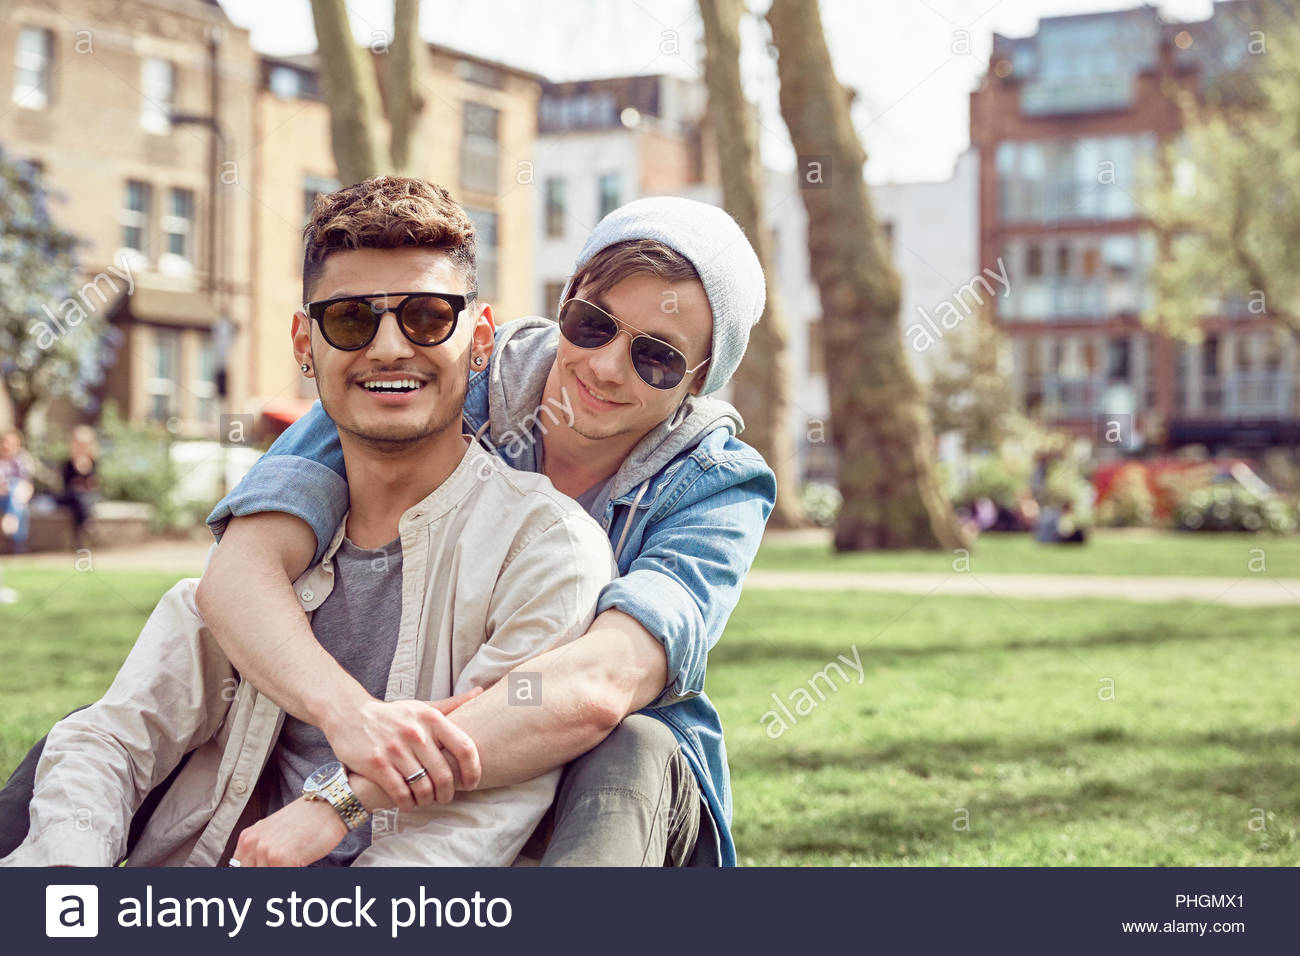 Asiatique Gay Dating blanc